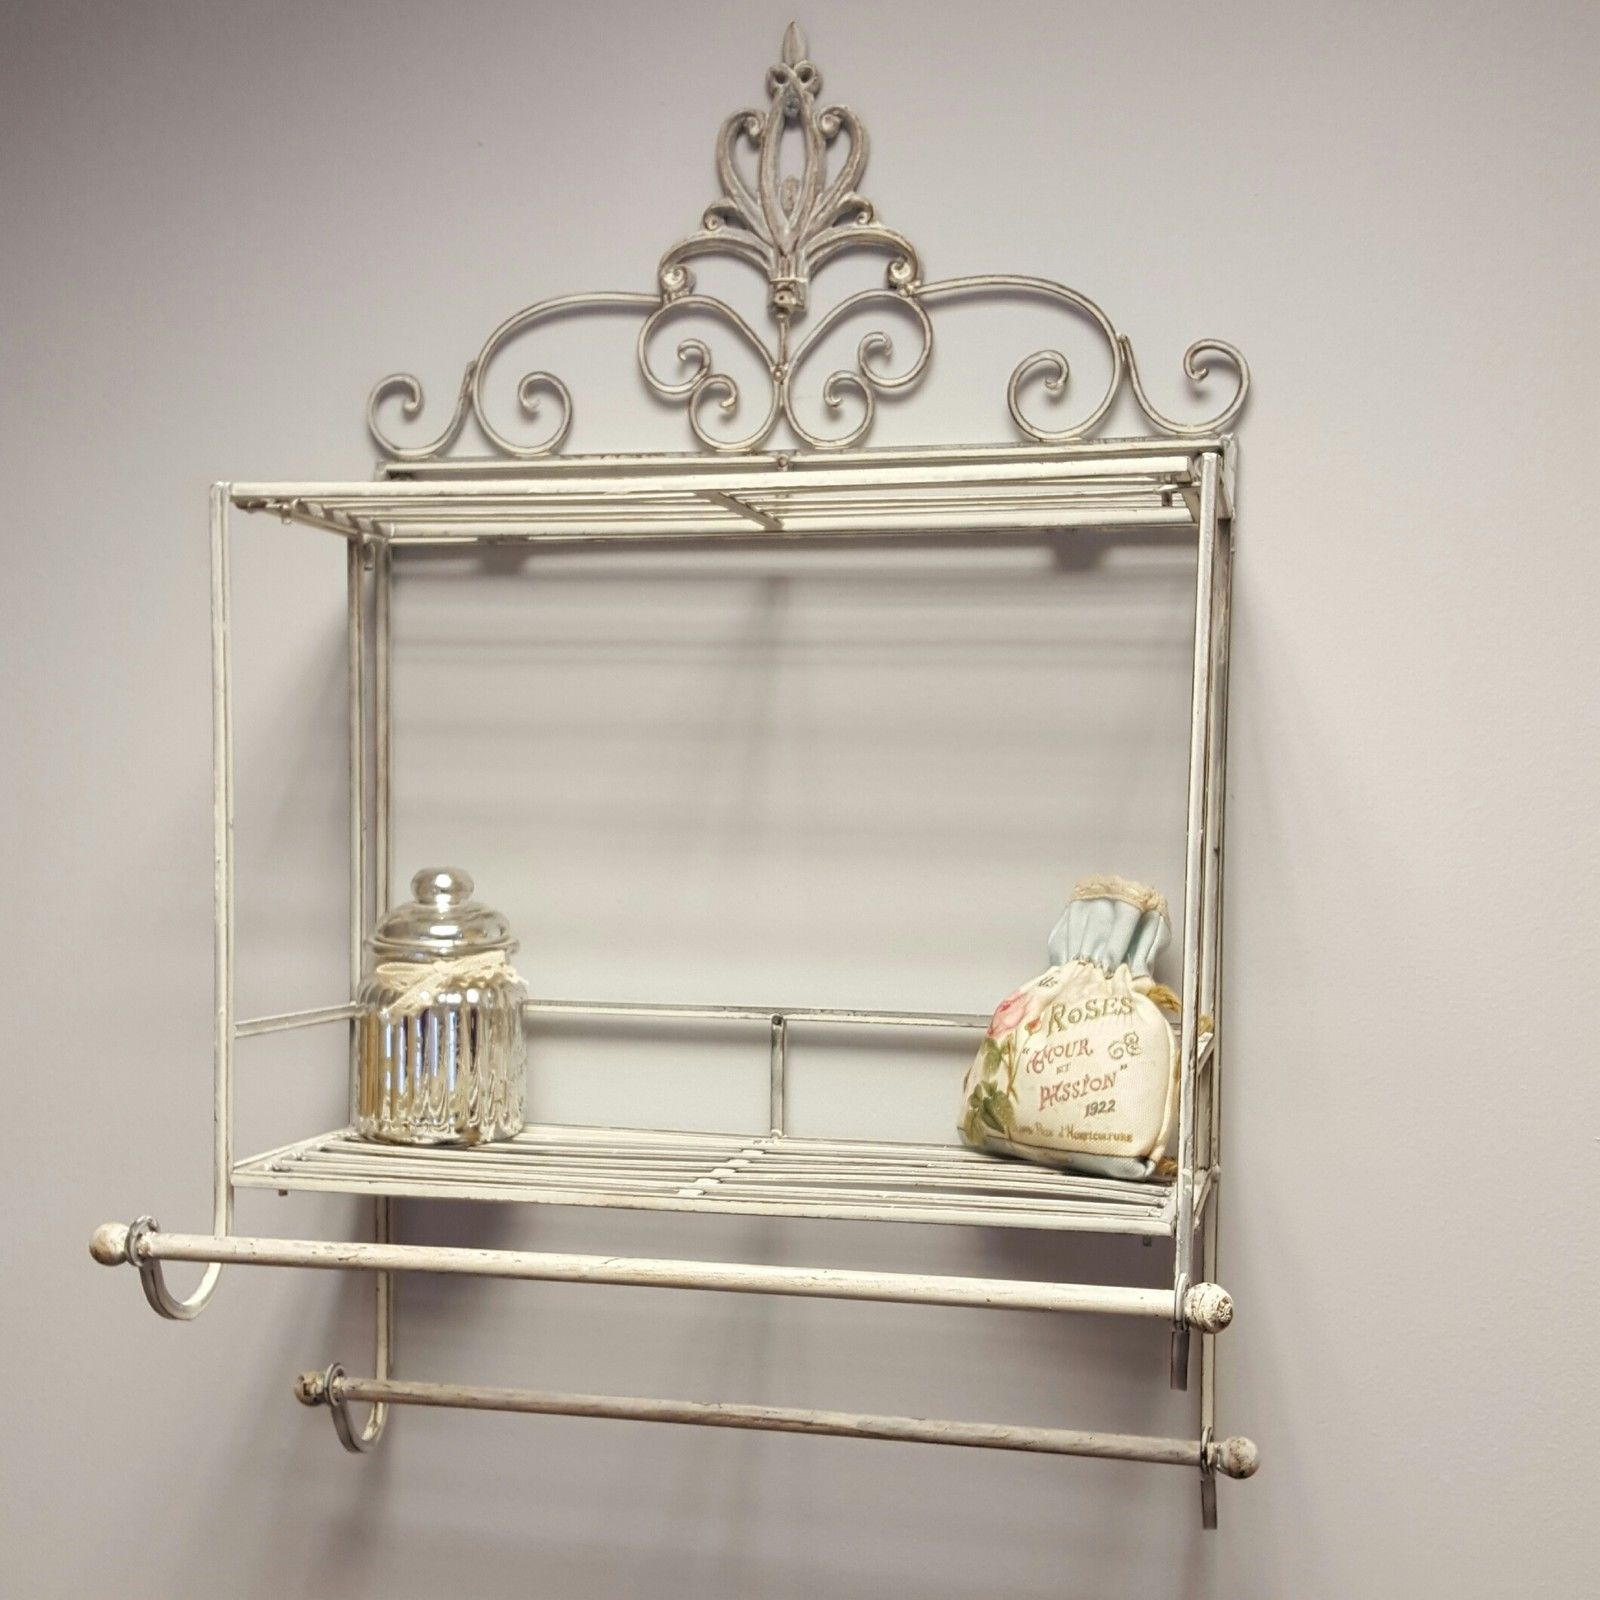 Shabby Chic Metal Wall Shelf Towel Rail Rack Storage Cabinet Bathroom  Kitchen | EBay